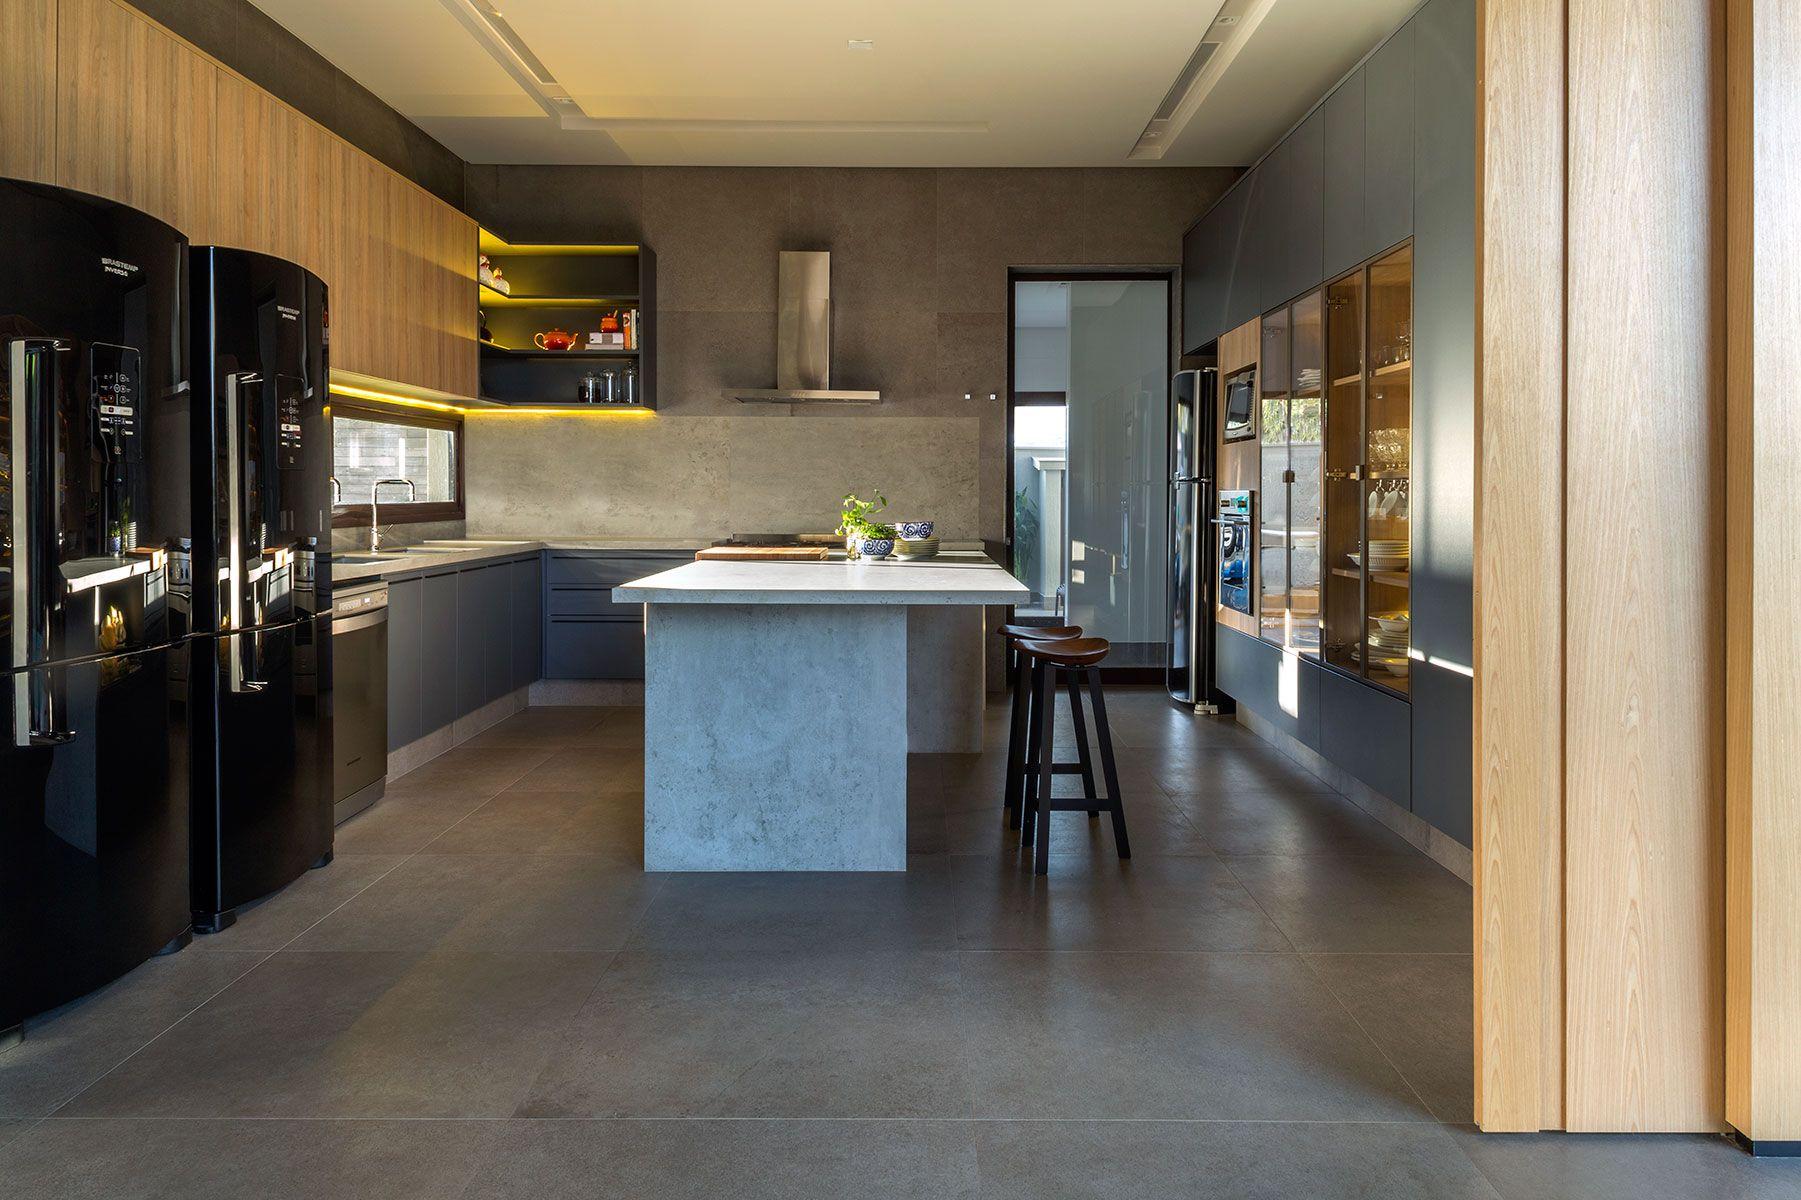 Tons Neutros E Naturais Armario Cozinha Decoracao De Casa